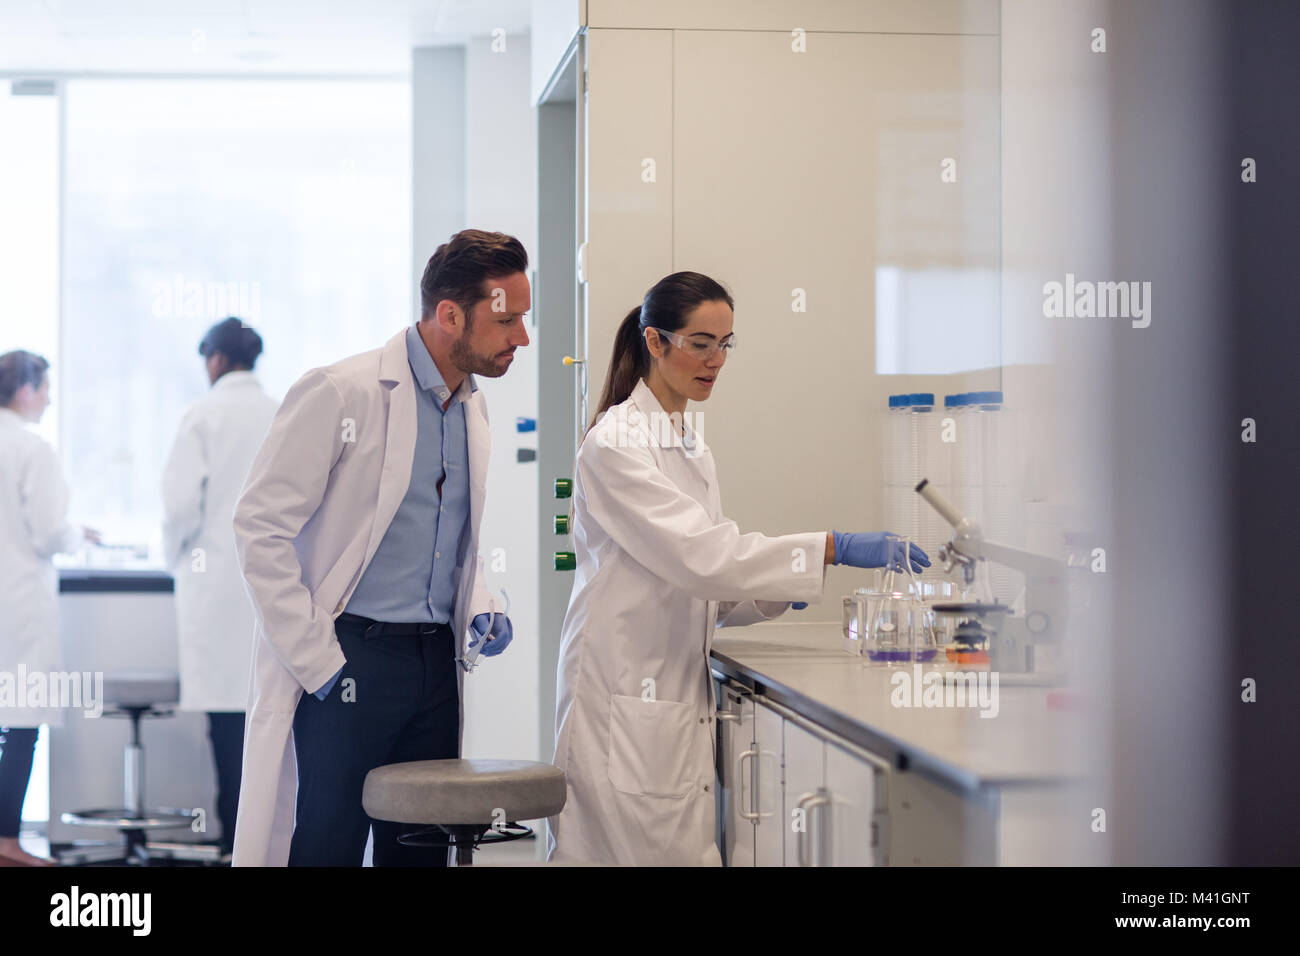 Studentin Wissenschaftler arbeiten an einem Experiment Stockbild